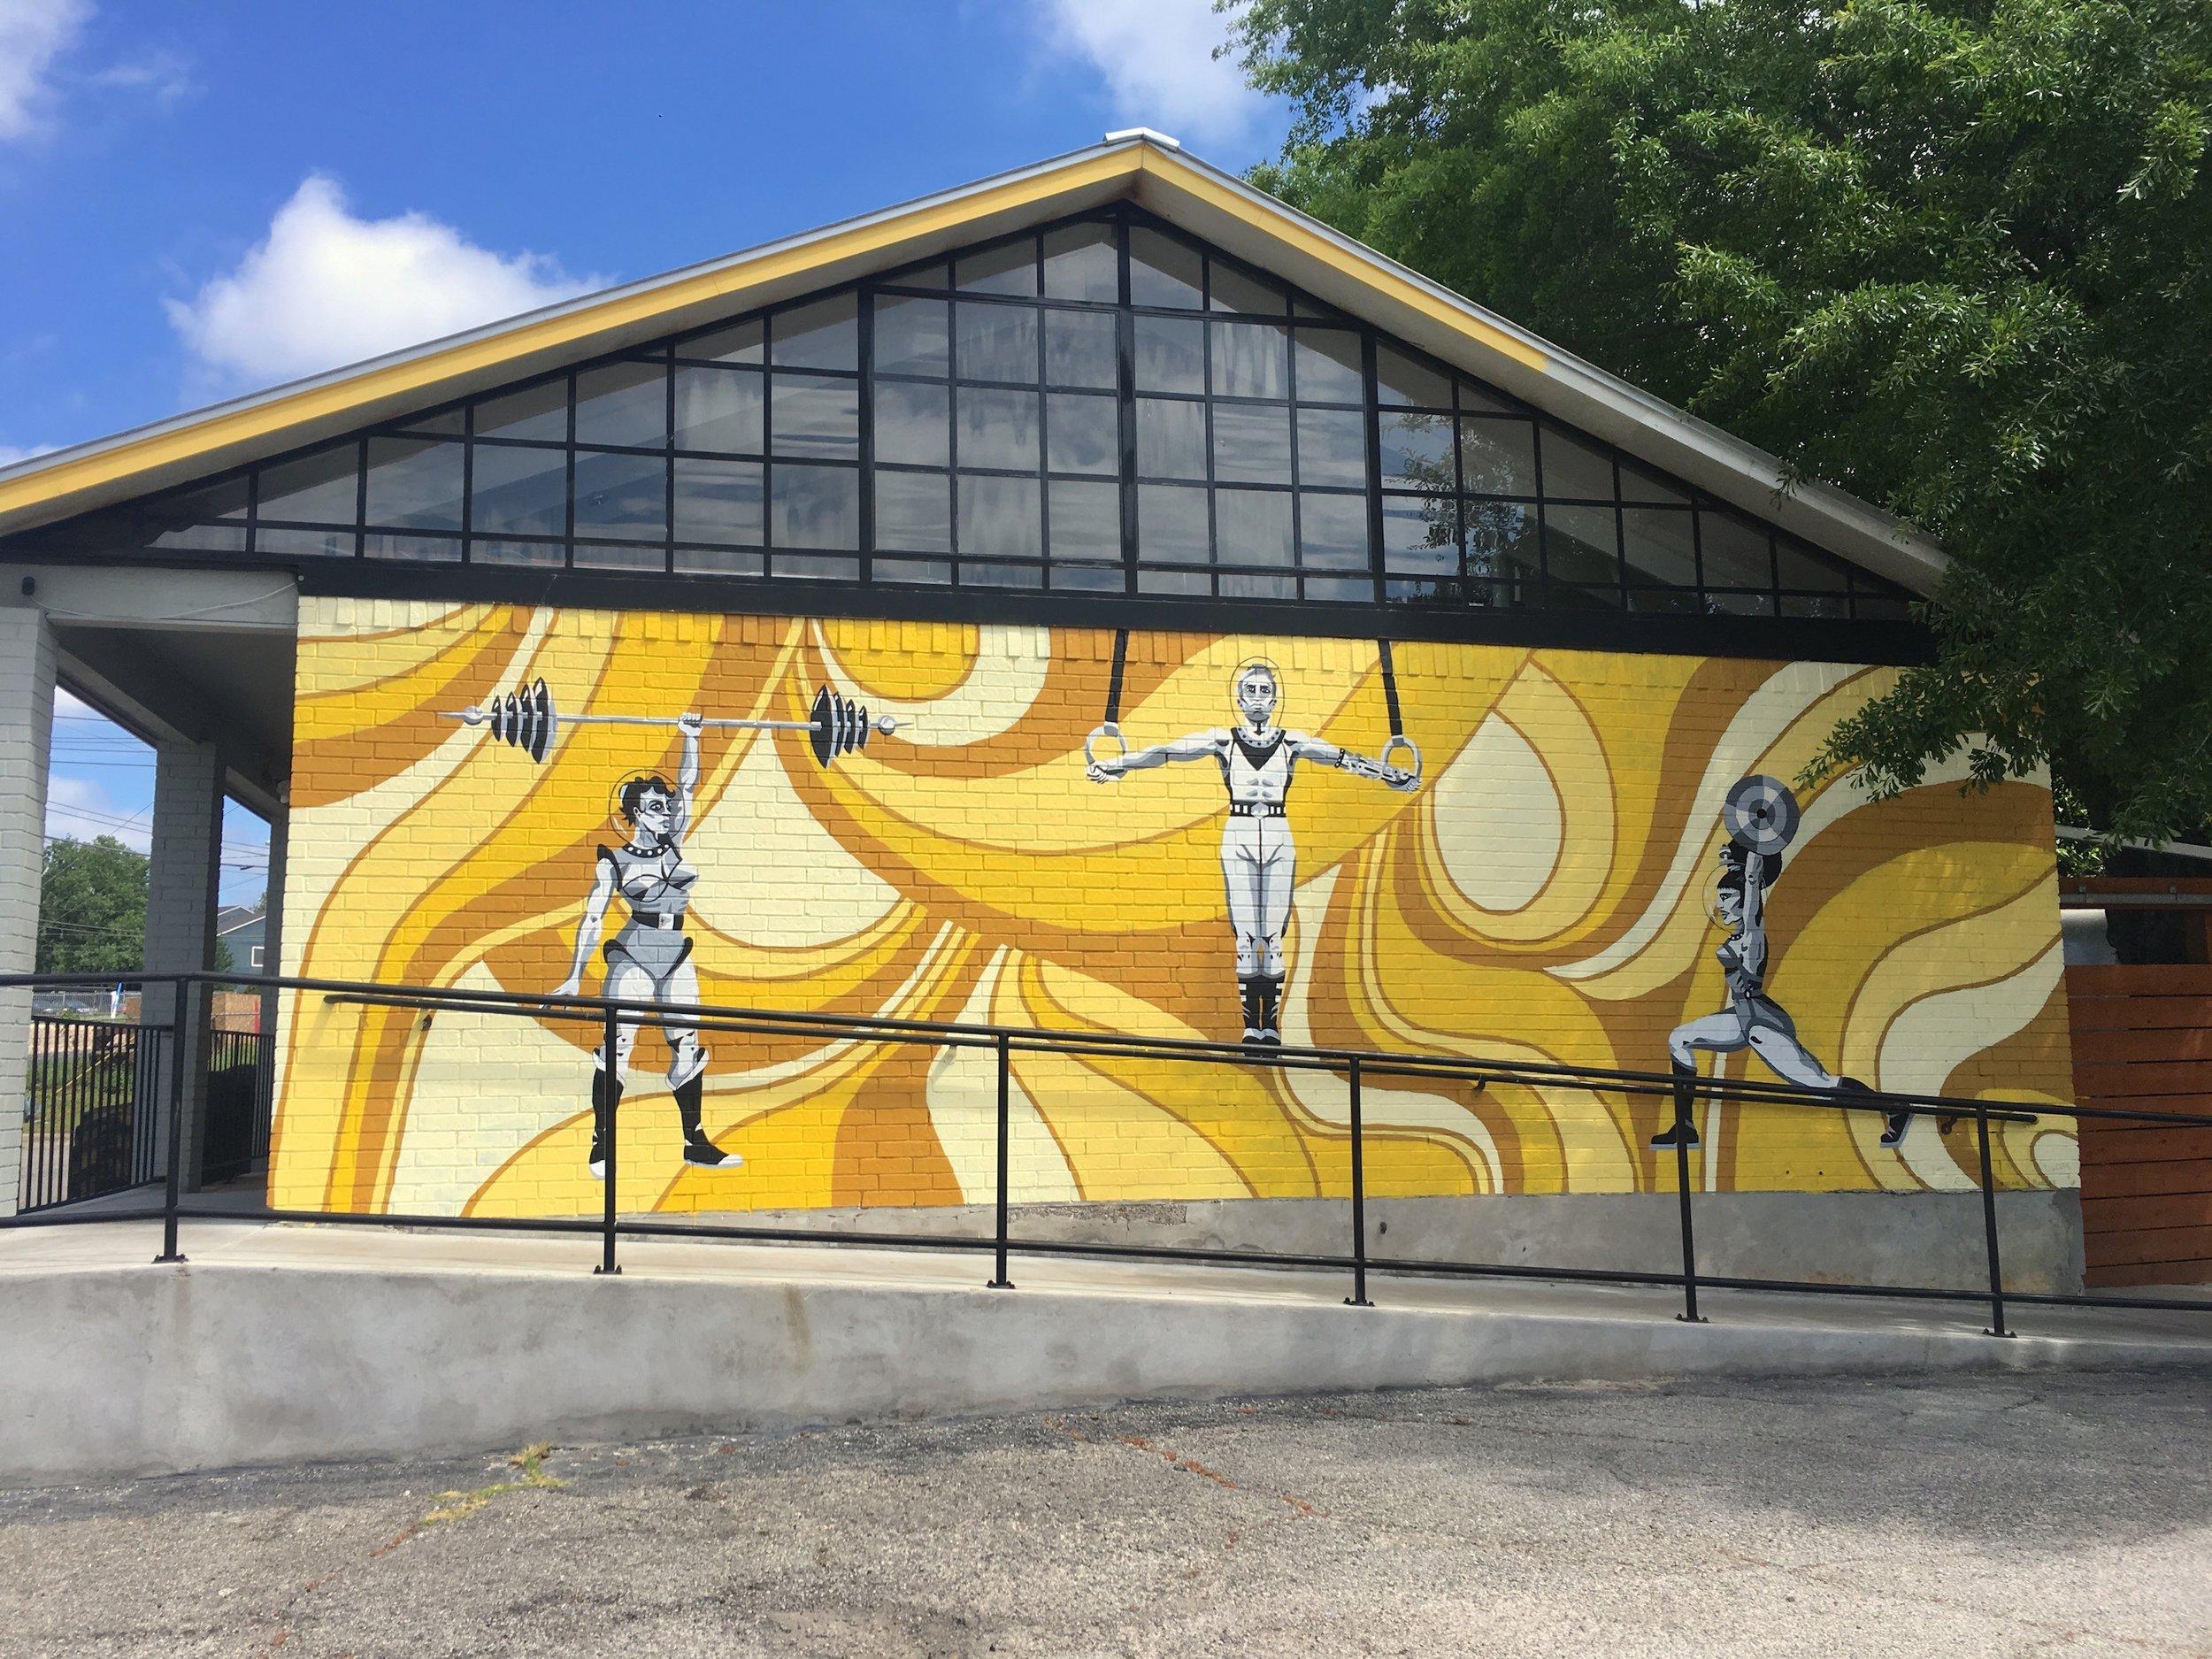 Space Lifters  for   Crossfit Lumos, 2415 Burleson Road, Austin, TX. 11 x 30 feet. 2019.